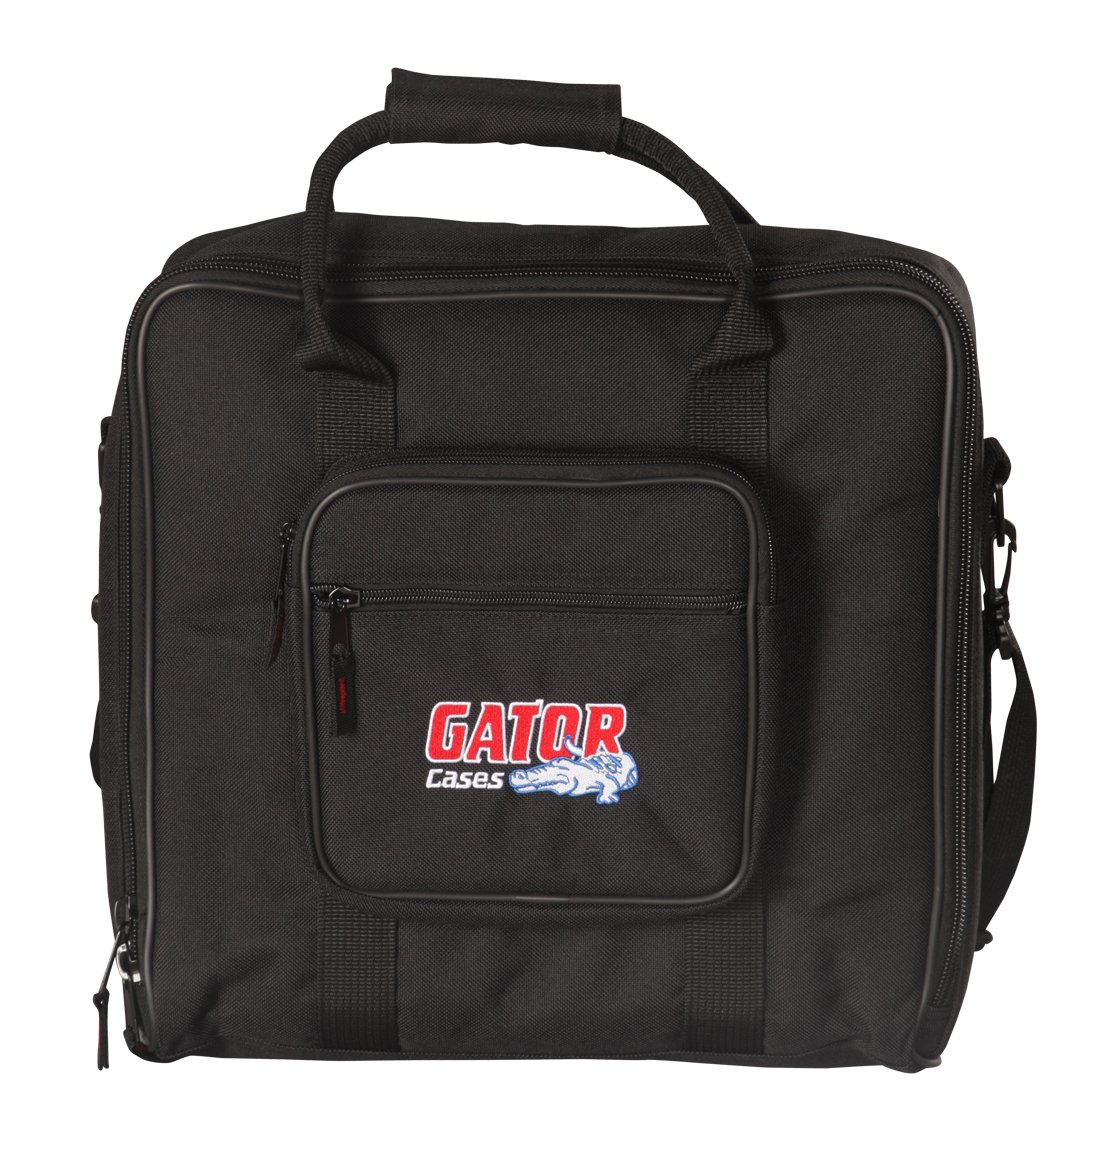 Gator 15 x 15 x 5.5 Inches Mixer/Gear Bag (G-MIX-B 1515)